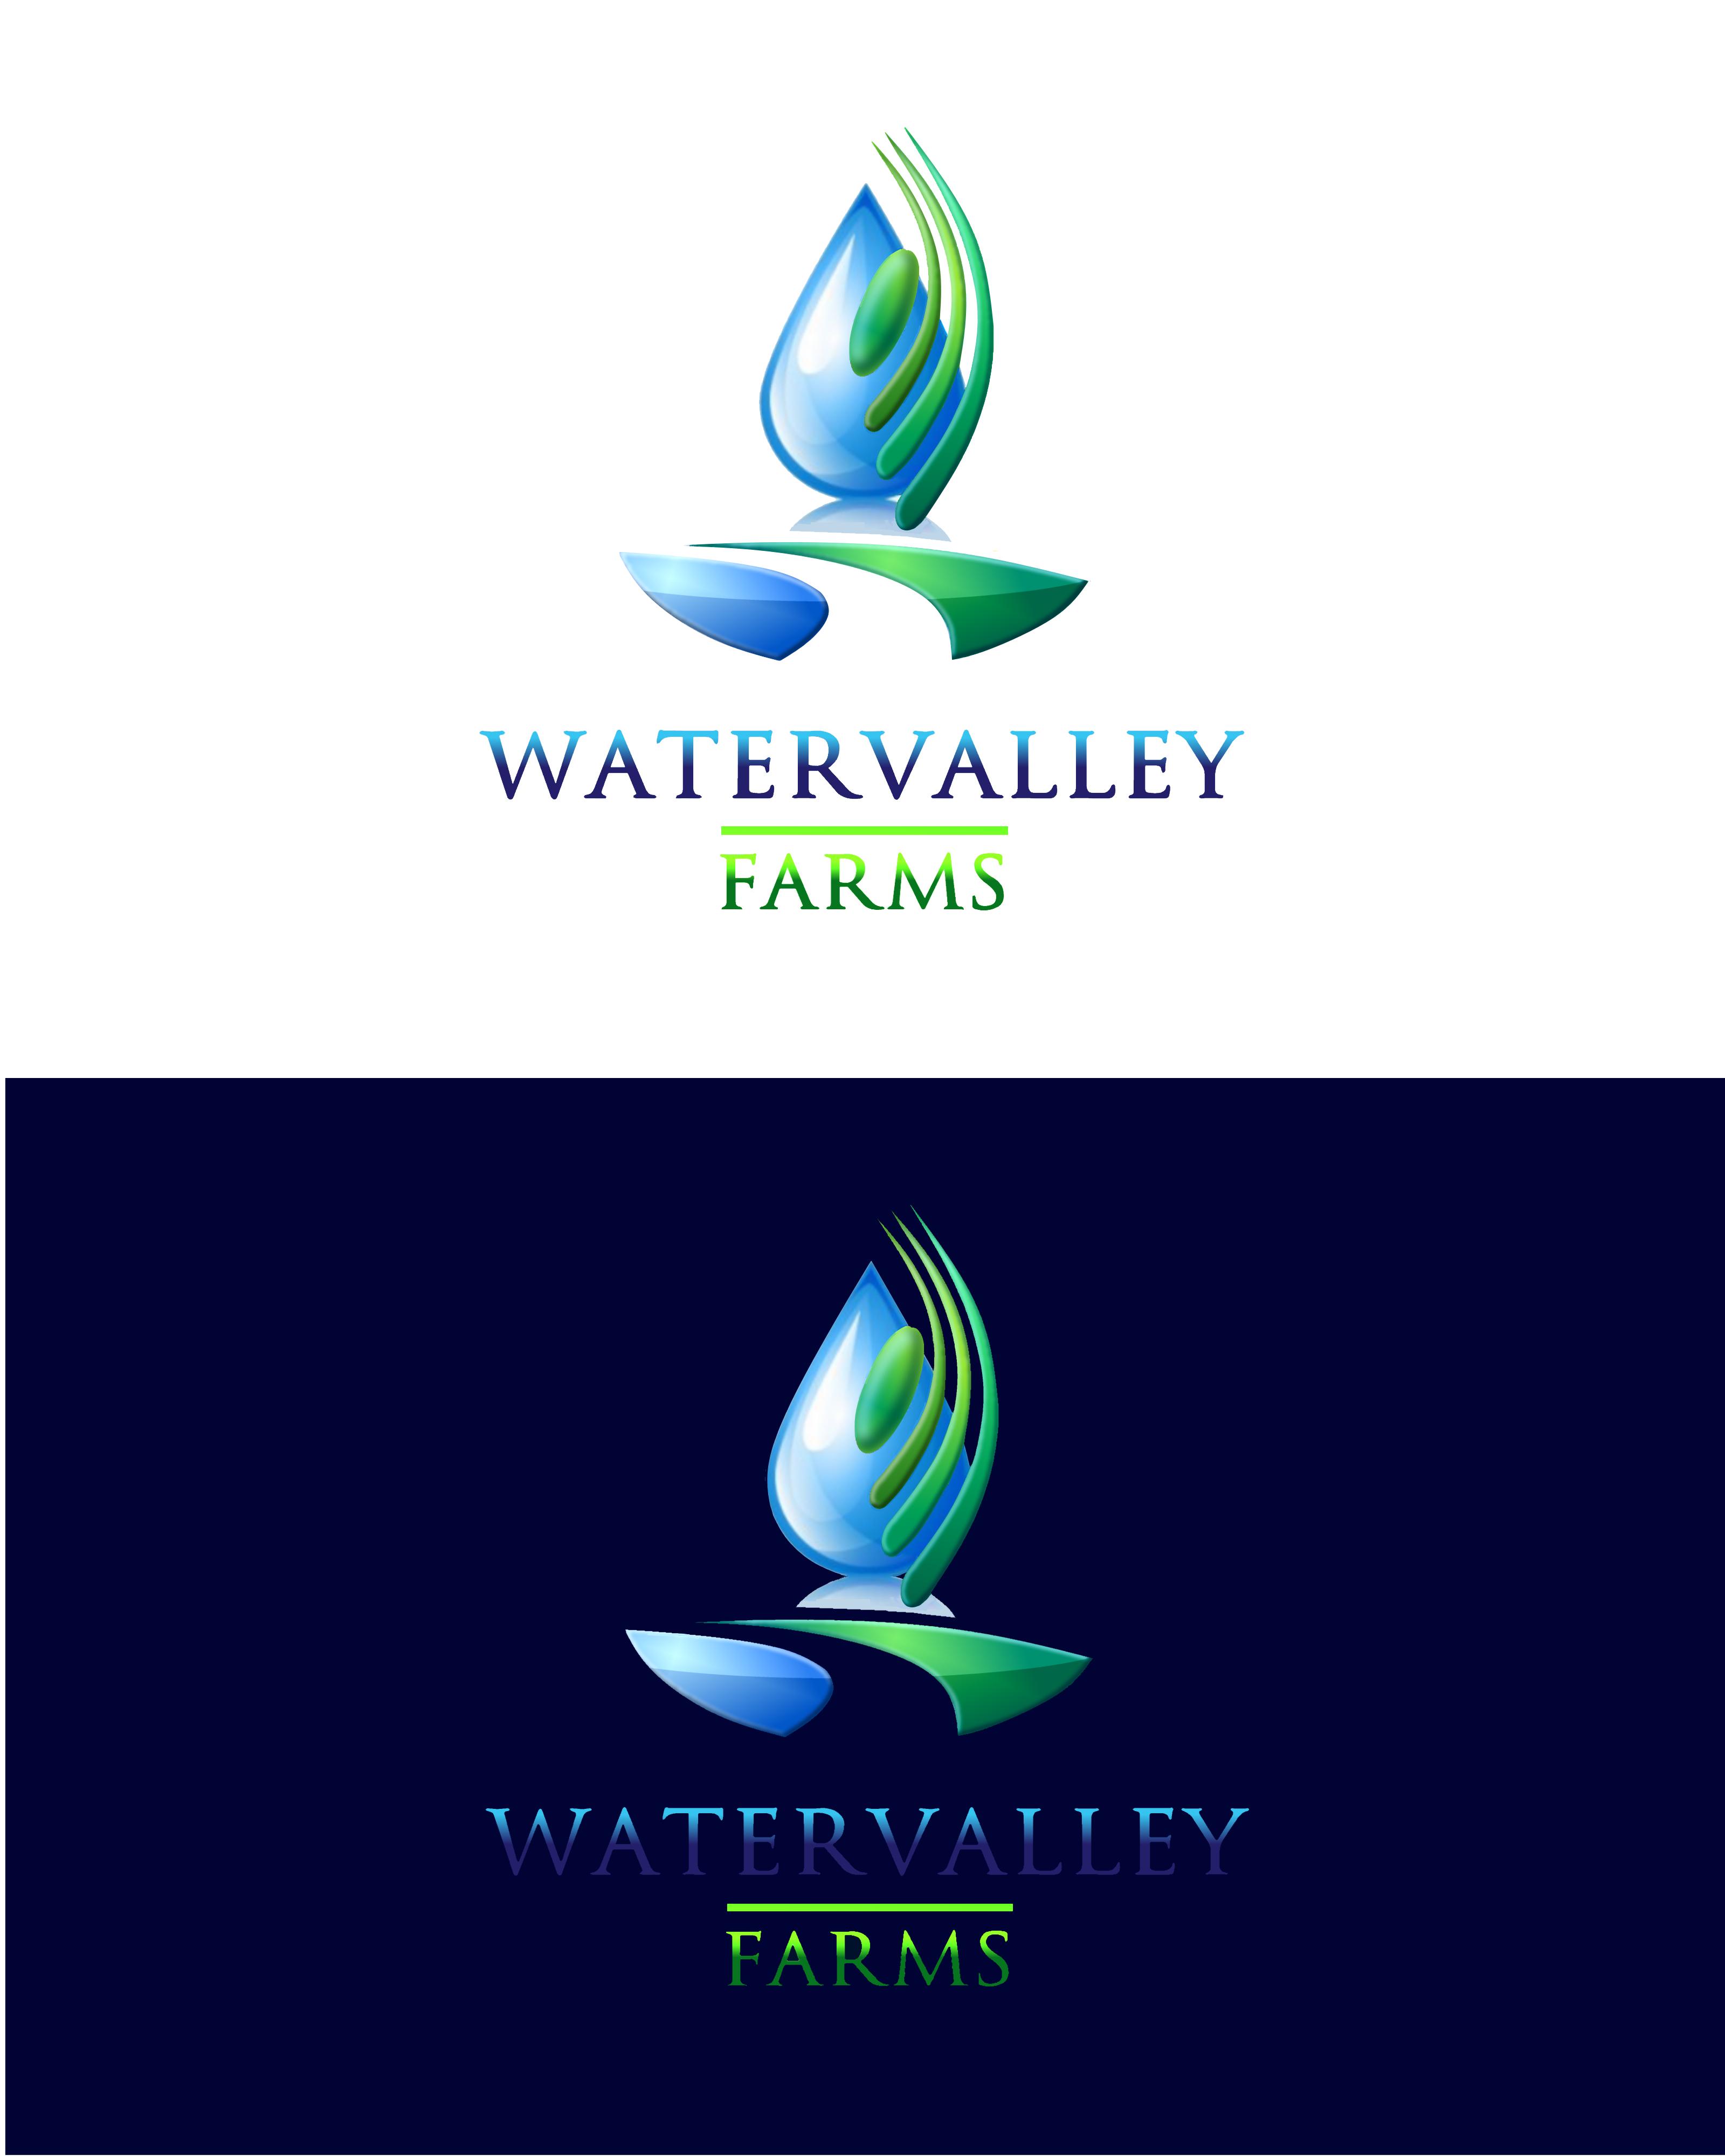 Logo Design by Roberto Bassi - Entry No. 82 in the Logo Design Contest New Logo Design for Watervalley Farms.